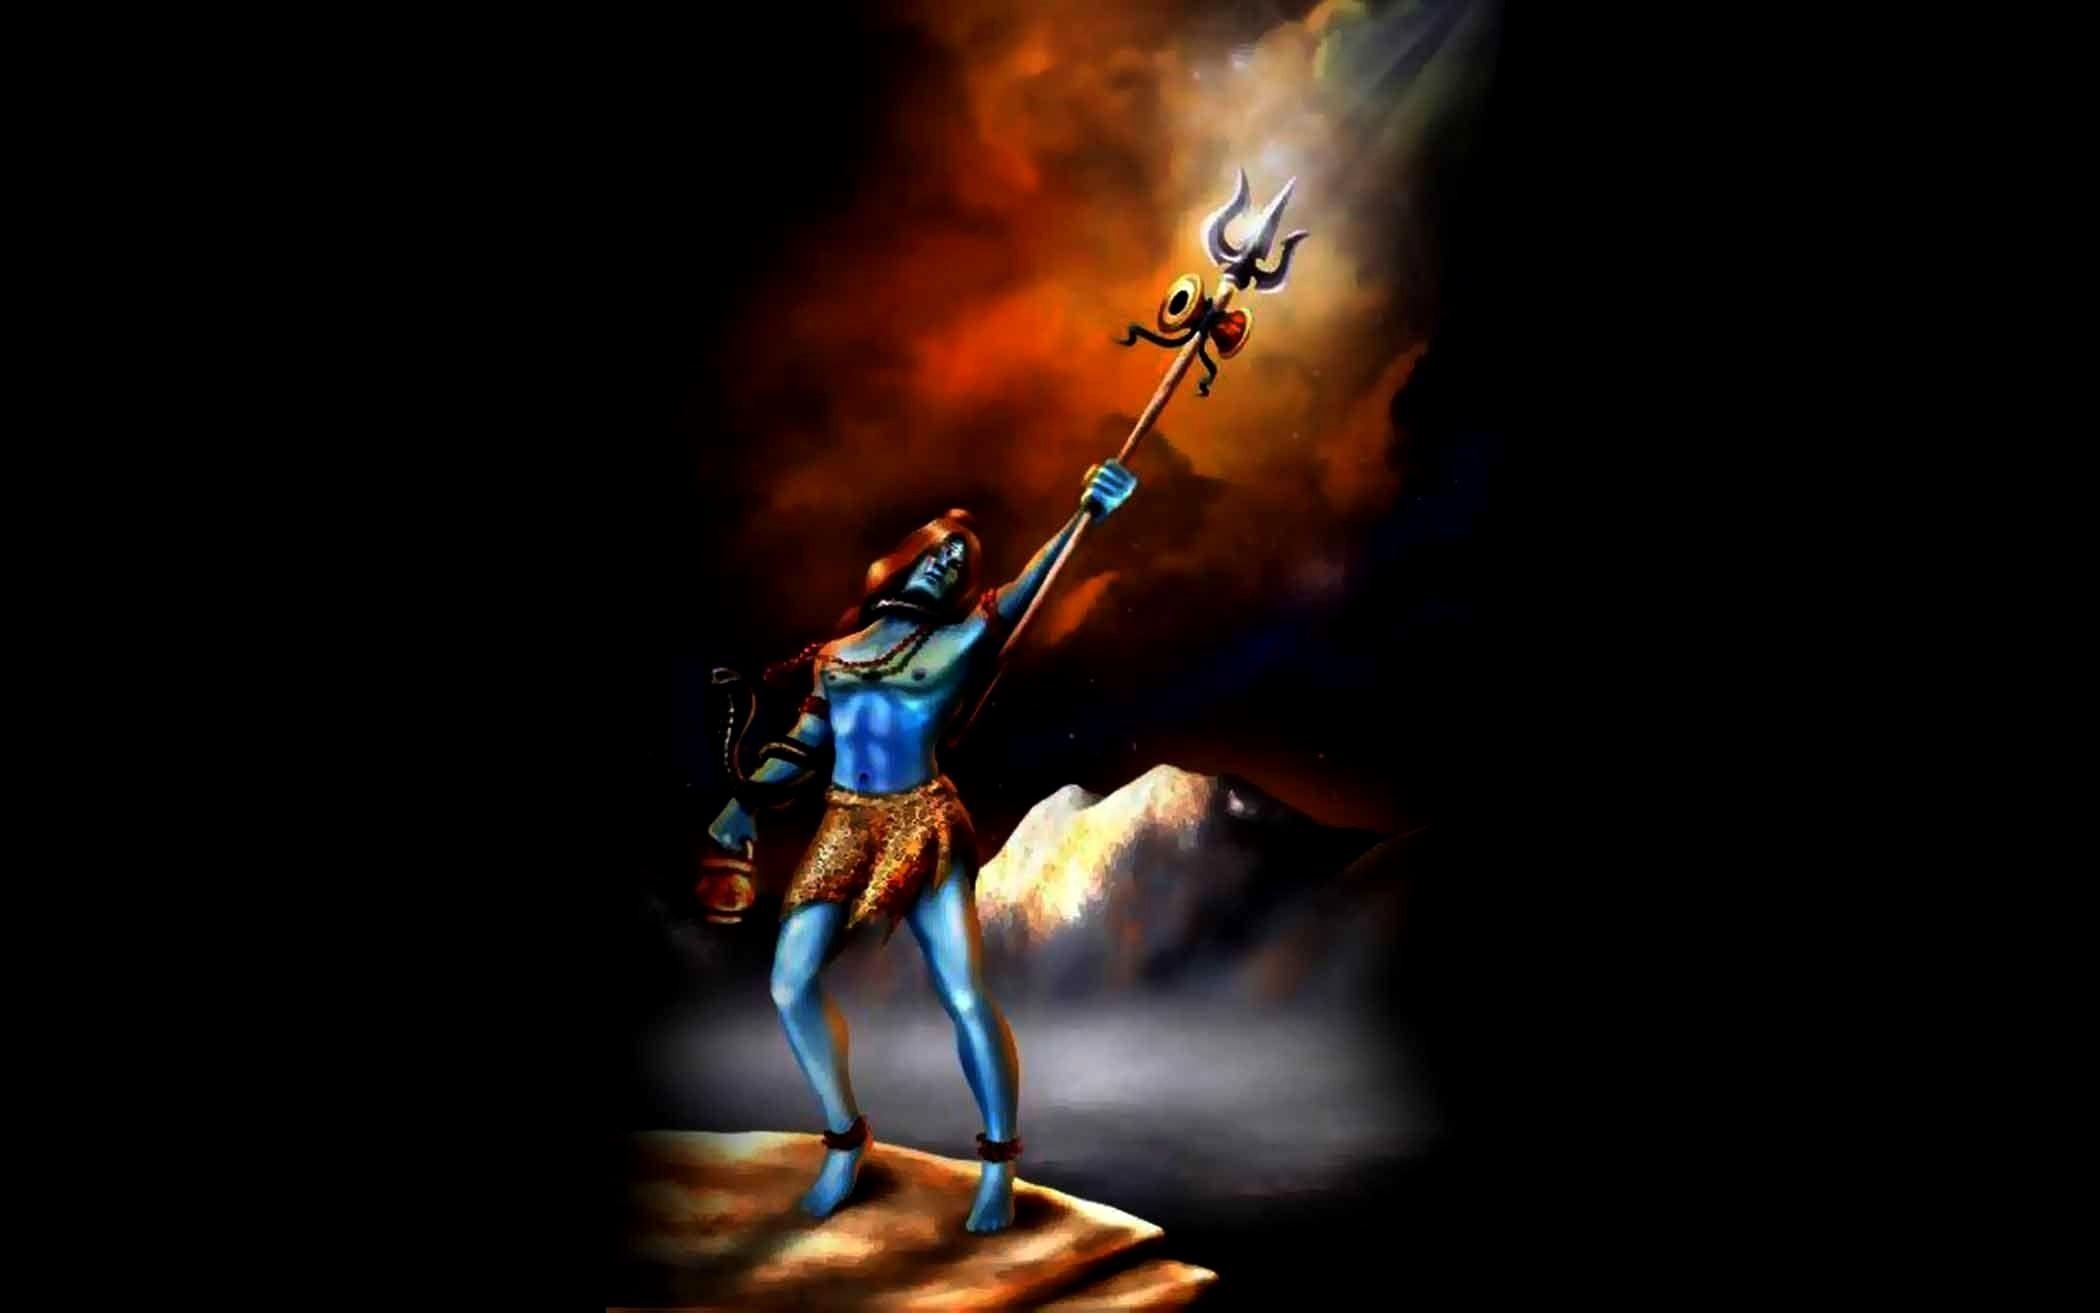 Shiv Shankar Wallpaper Hd Full Size 1080p Download Lord Krishna Hd Wallpaper Shiva Wallpaper Hd Wallpapers 1080p